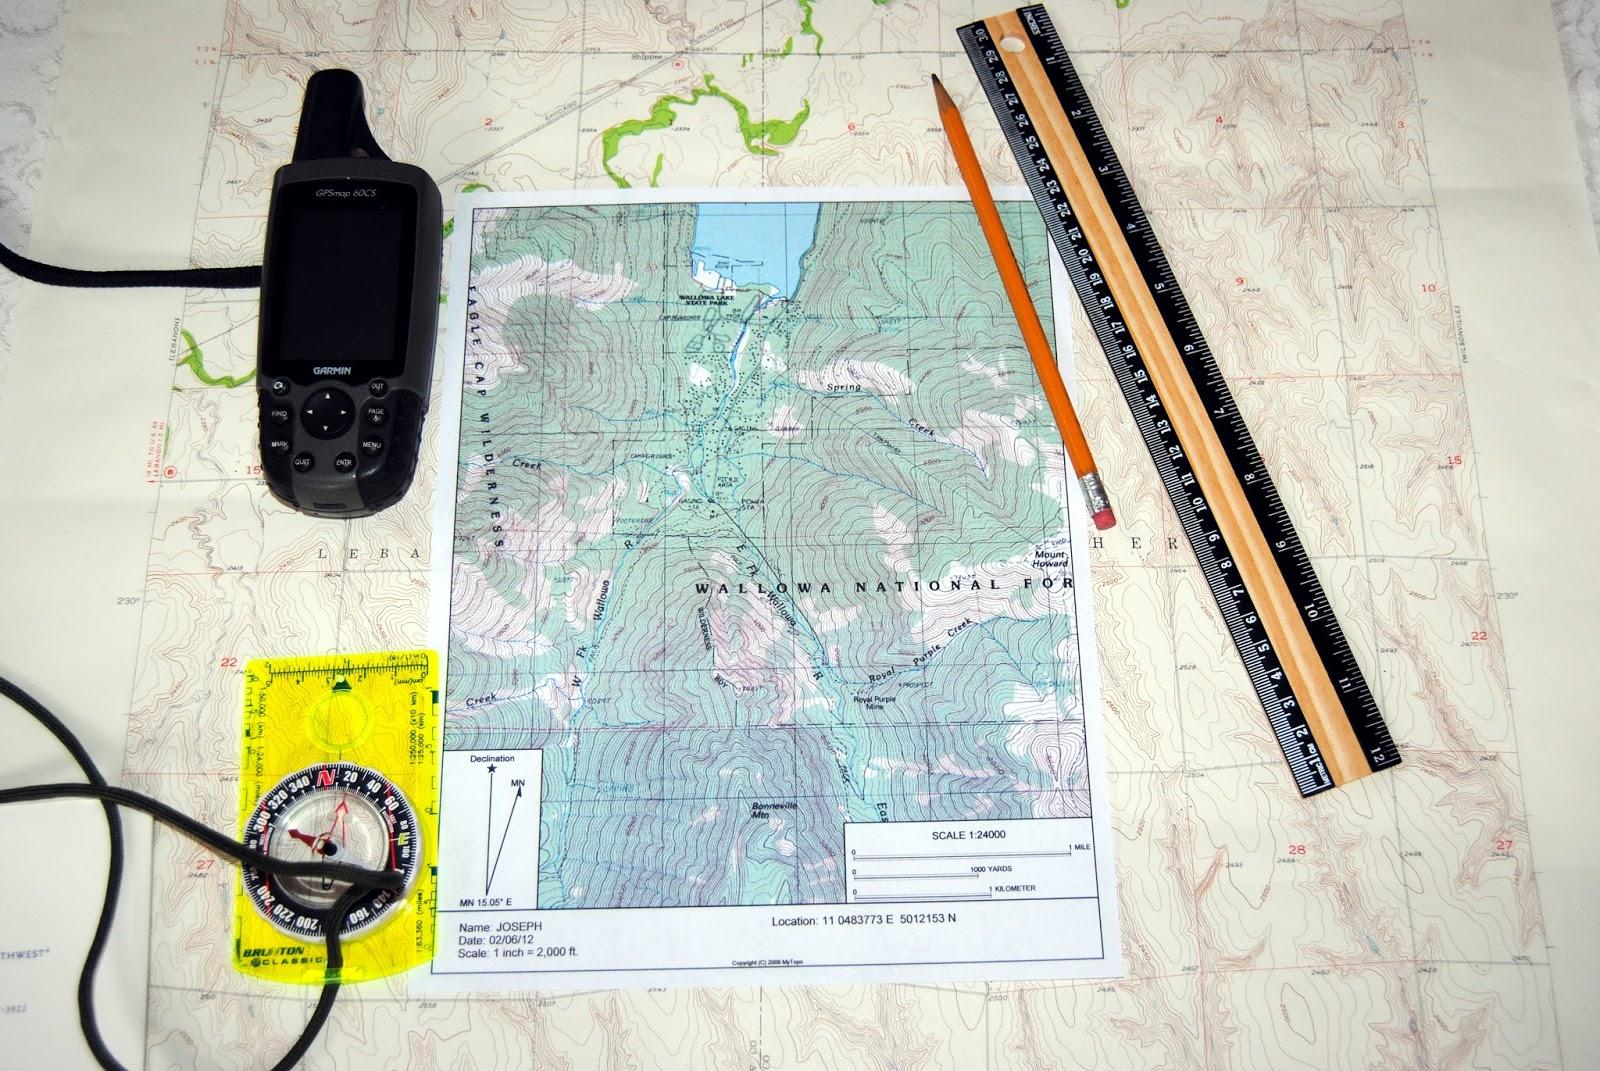 outdoor quest blake miller image